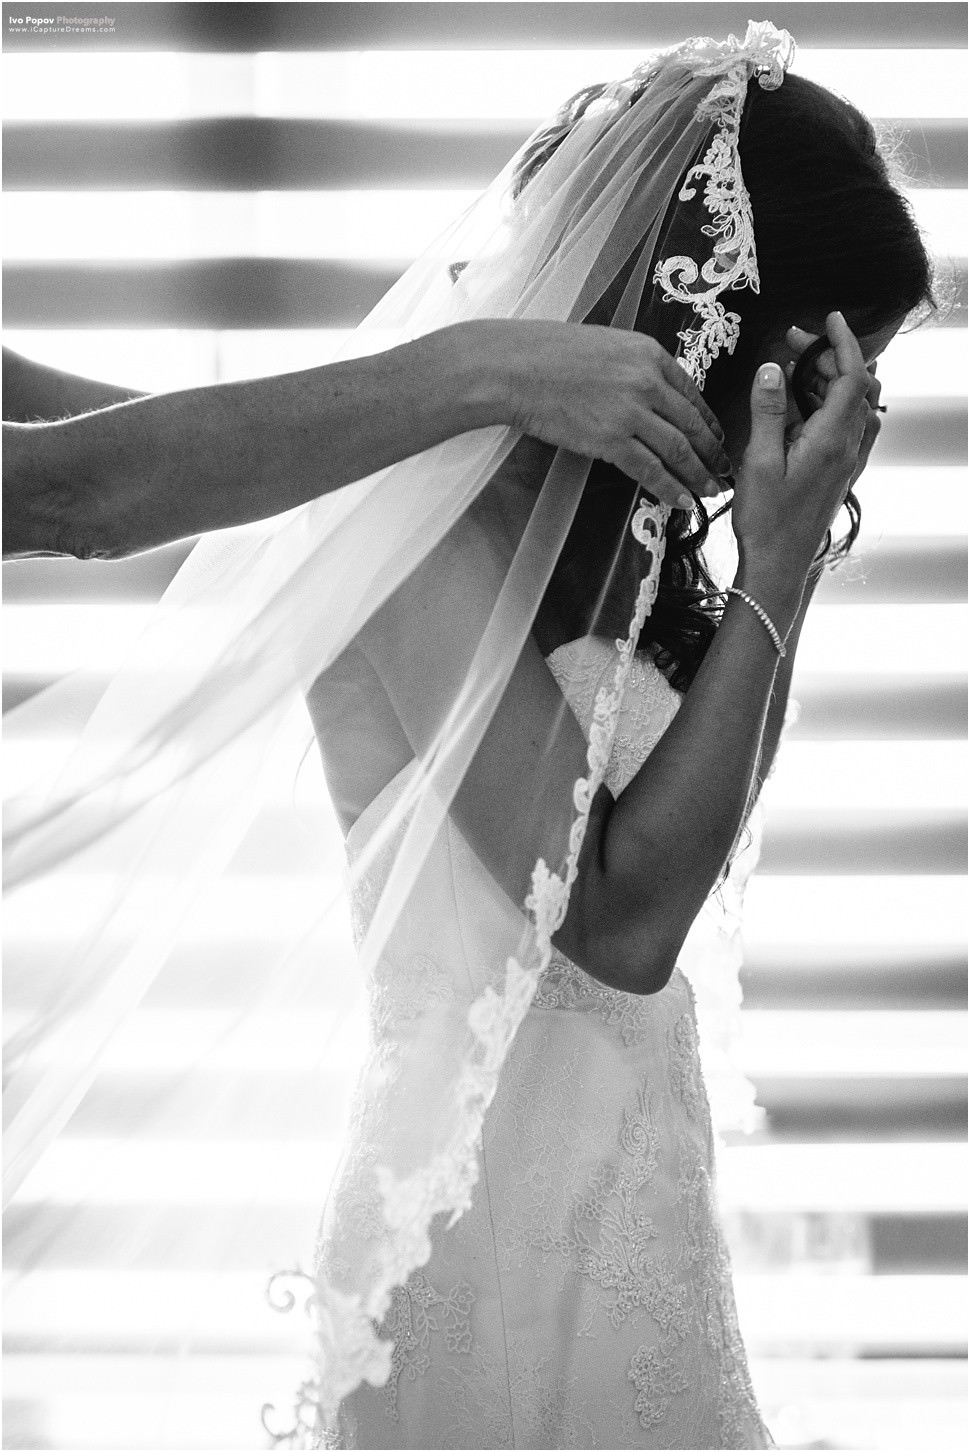 Huwelijksfotograaf Ivo Popov_3787